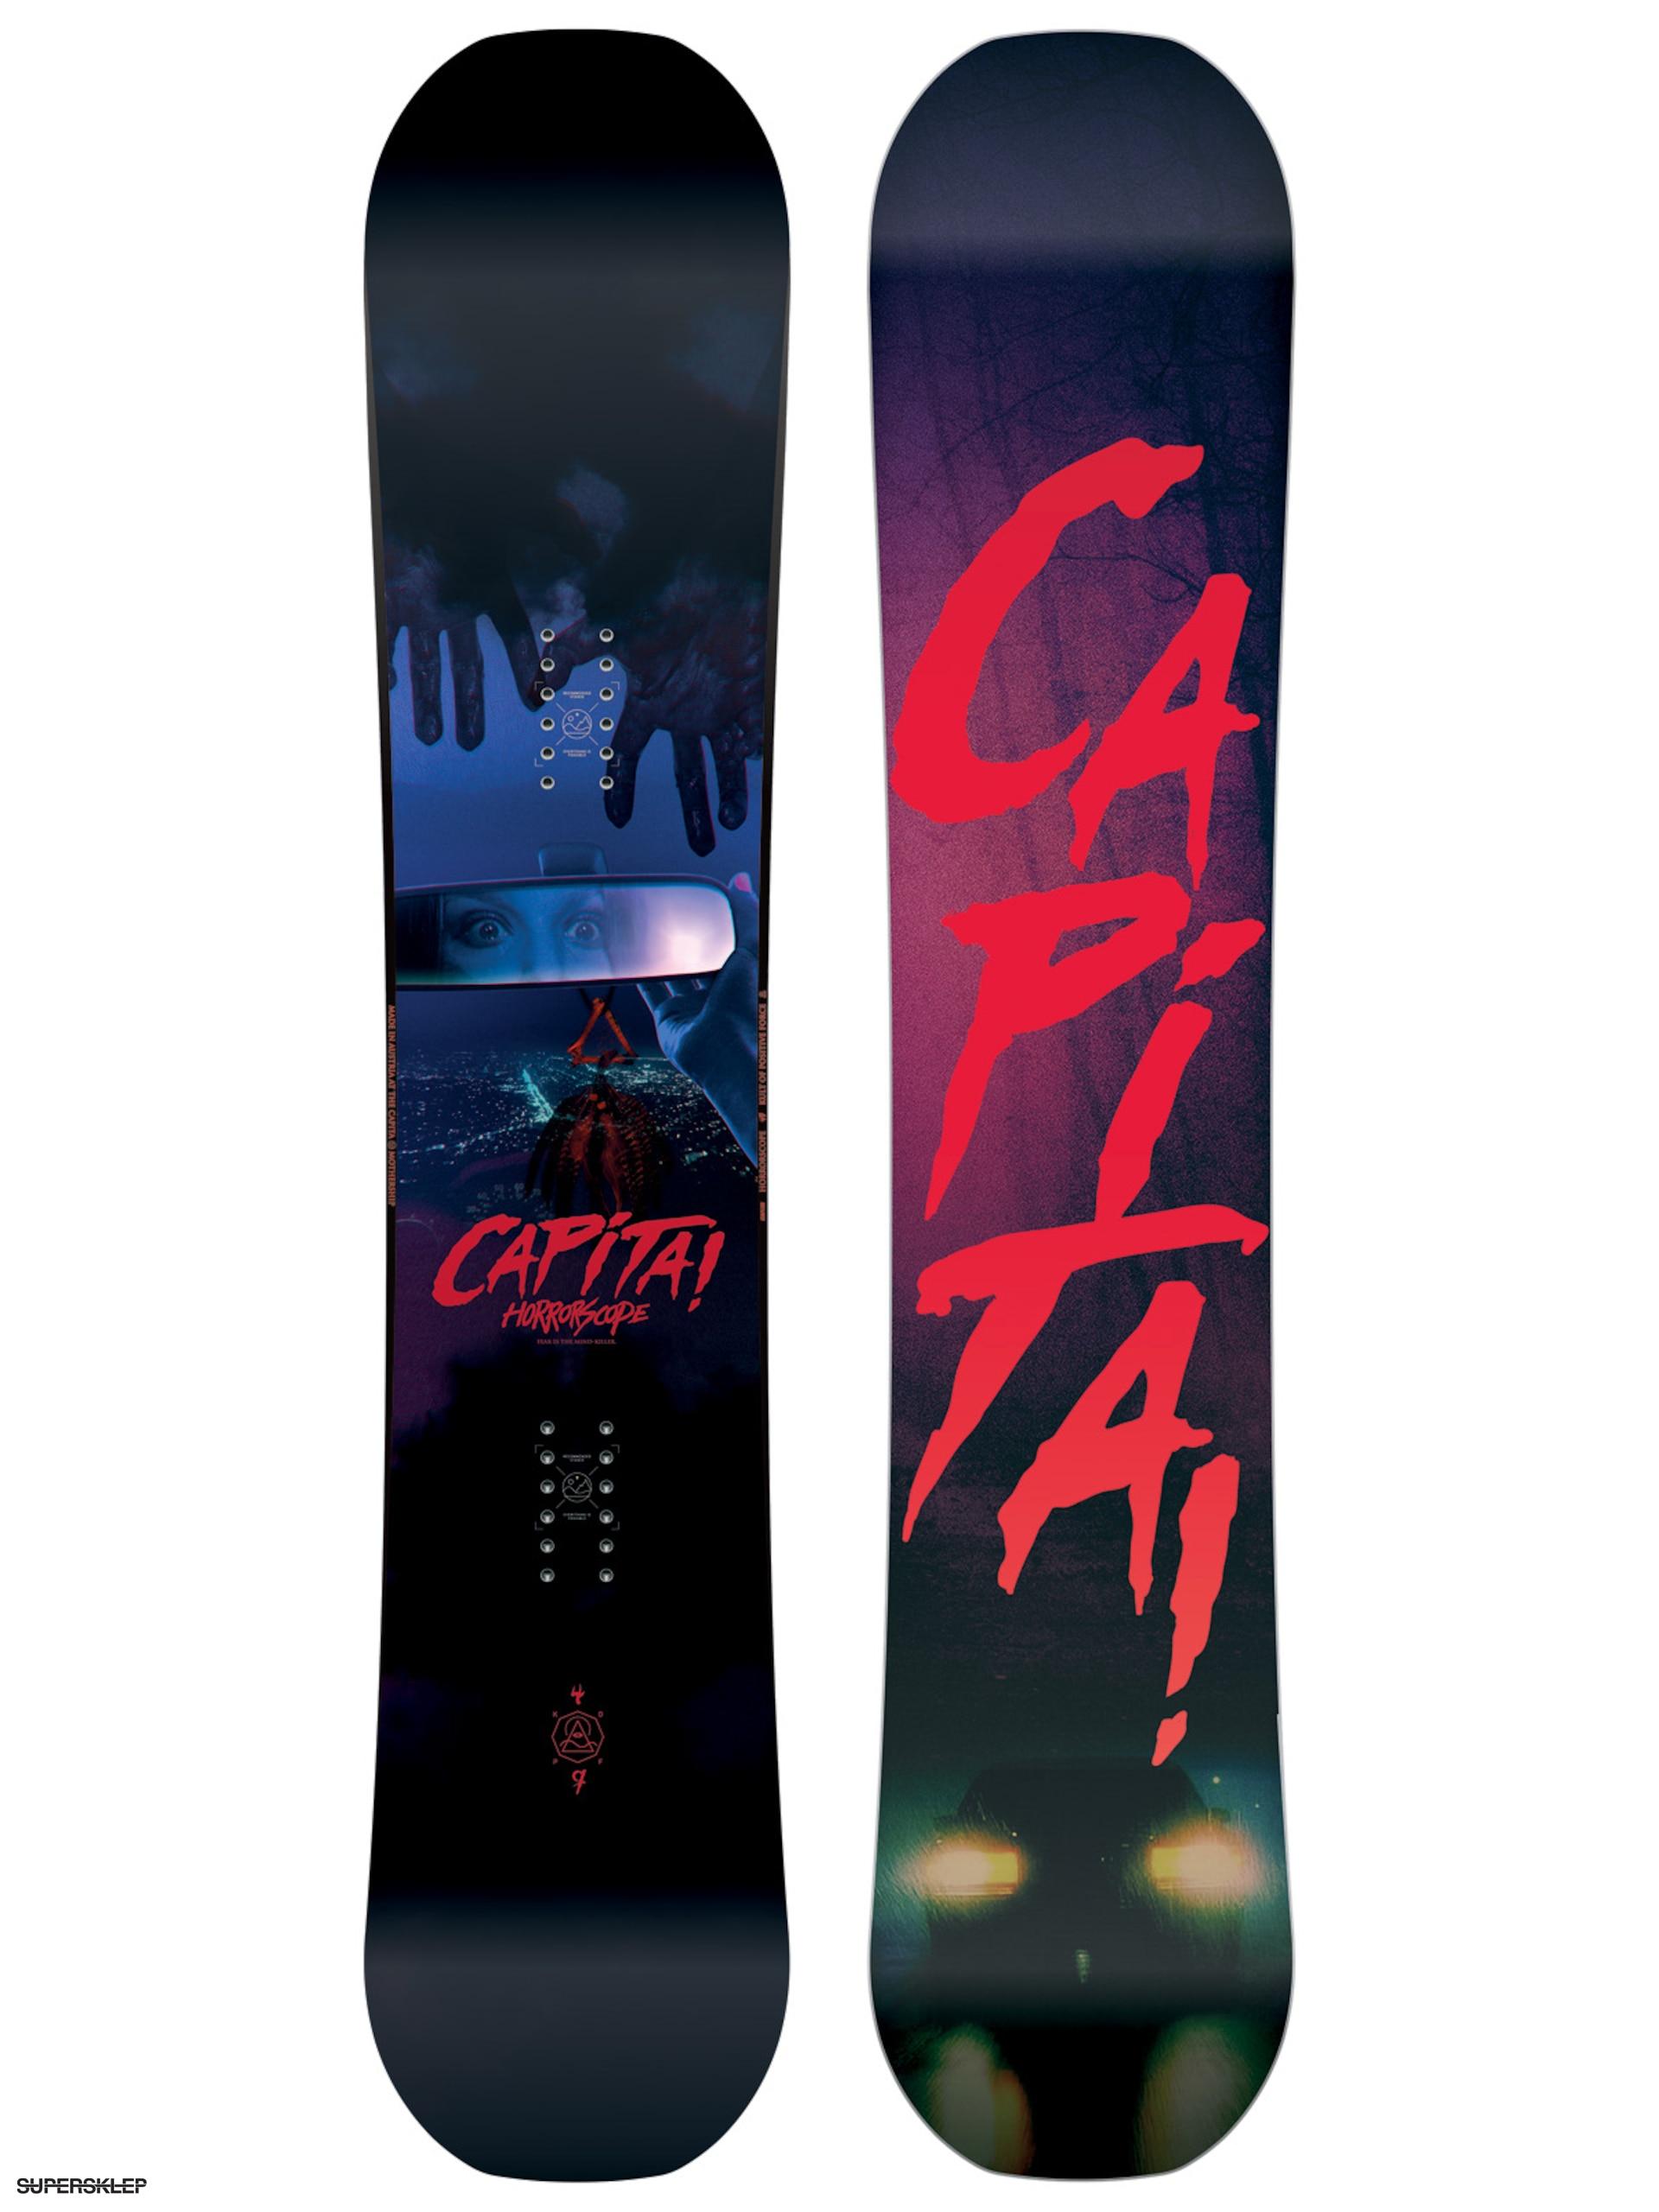 Deska snowboardowa Capita Horrorscope 149 (red black) 77db07c5ae